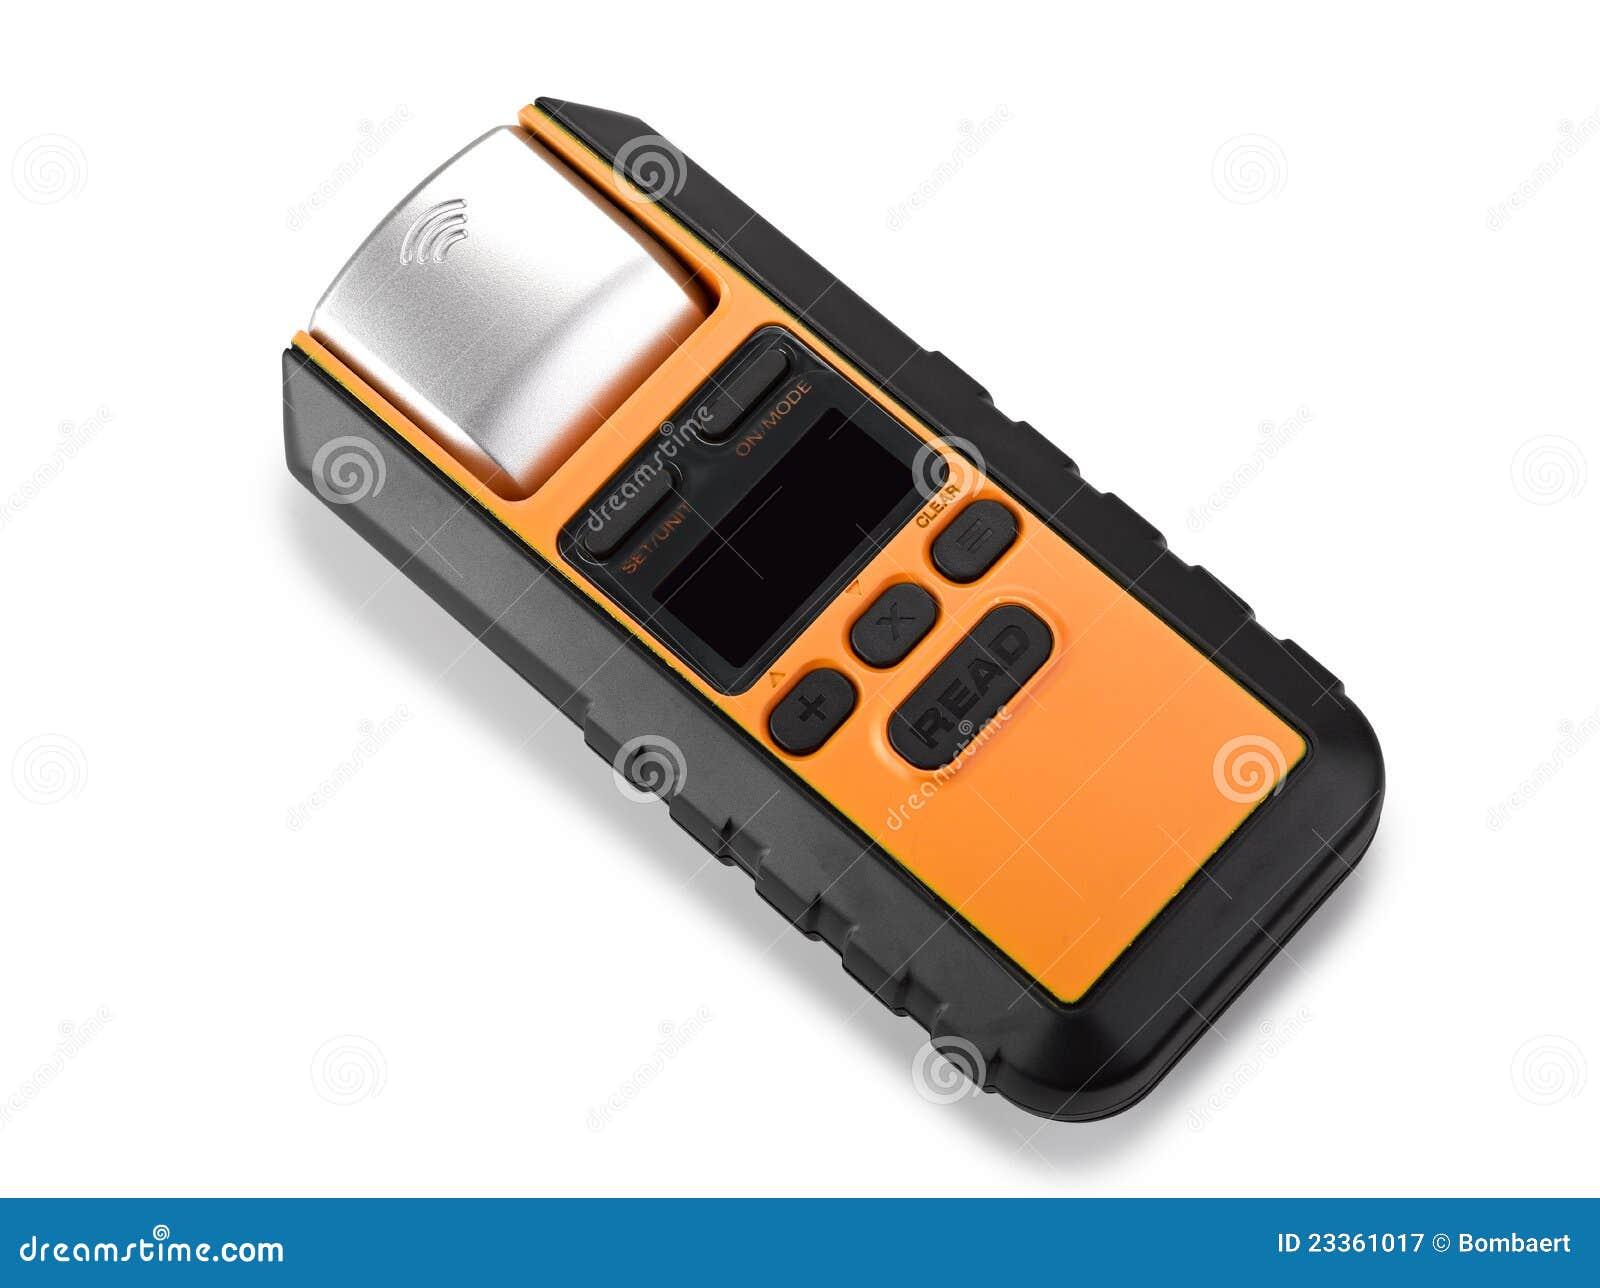 Laser Measuring Instruments : D man surveyor with laser distance meter hardhat and